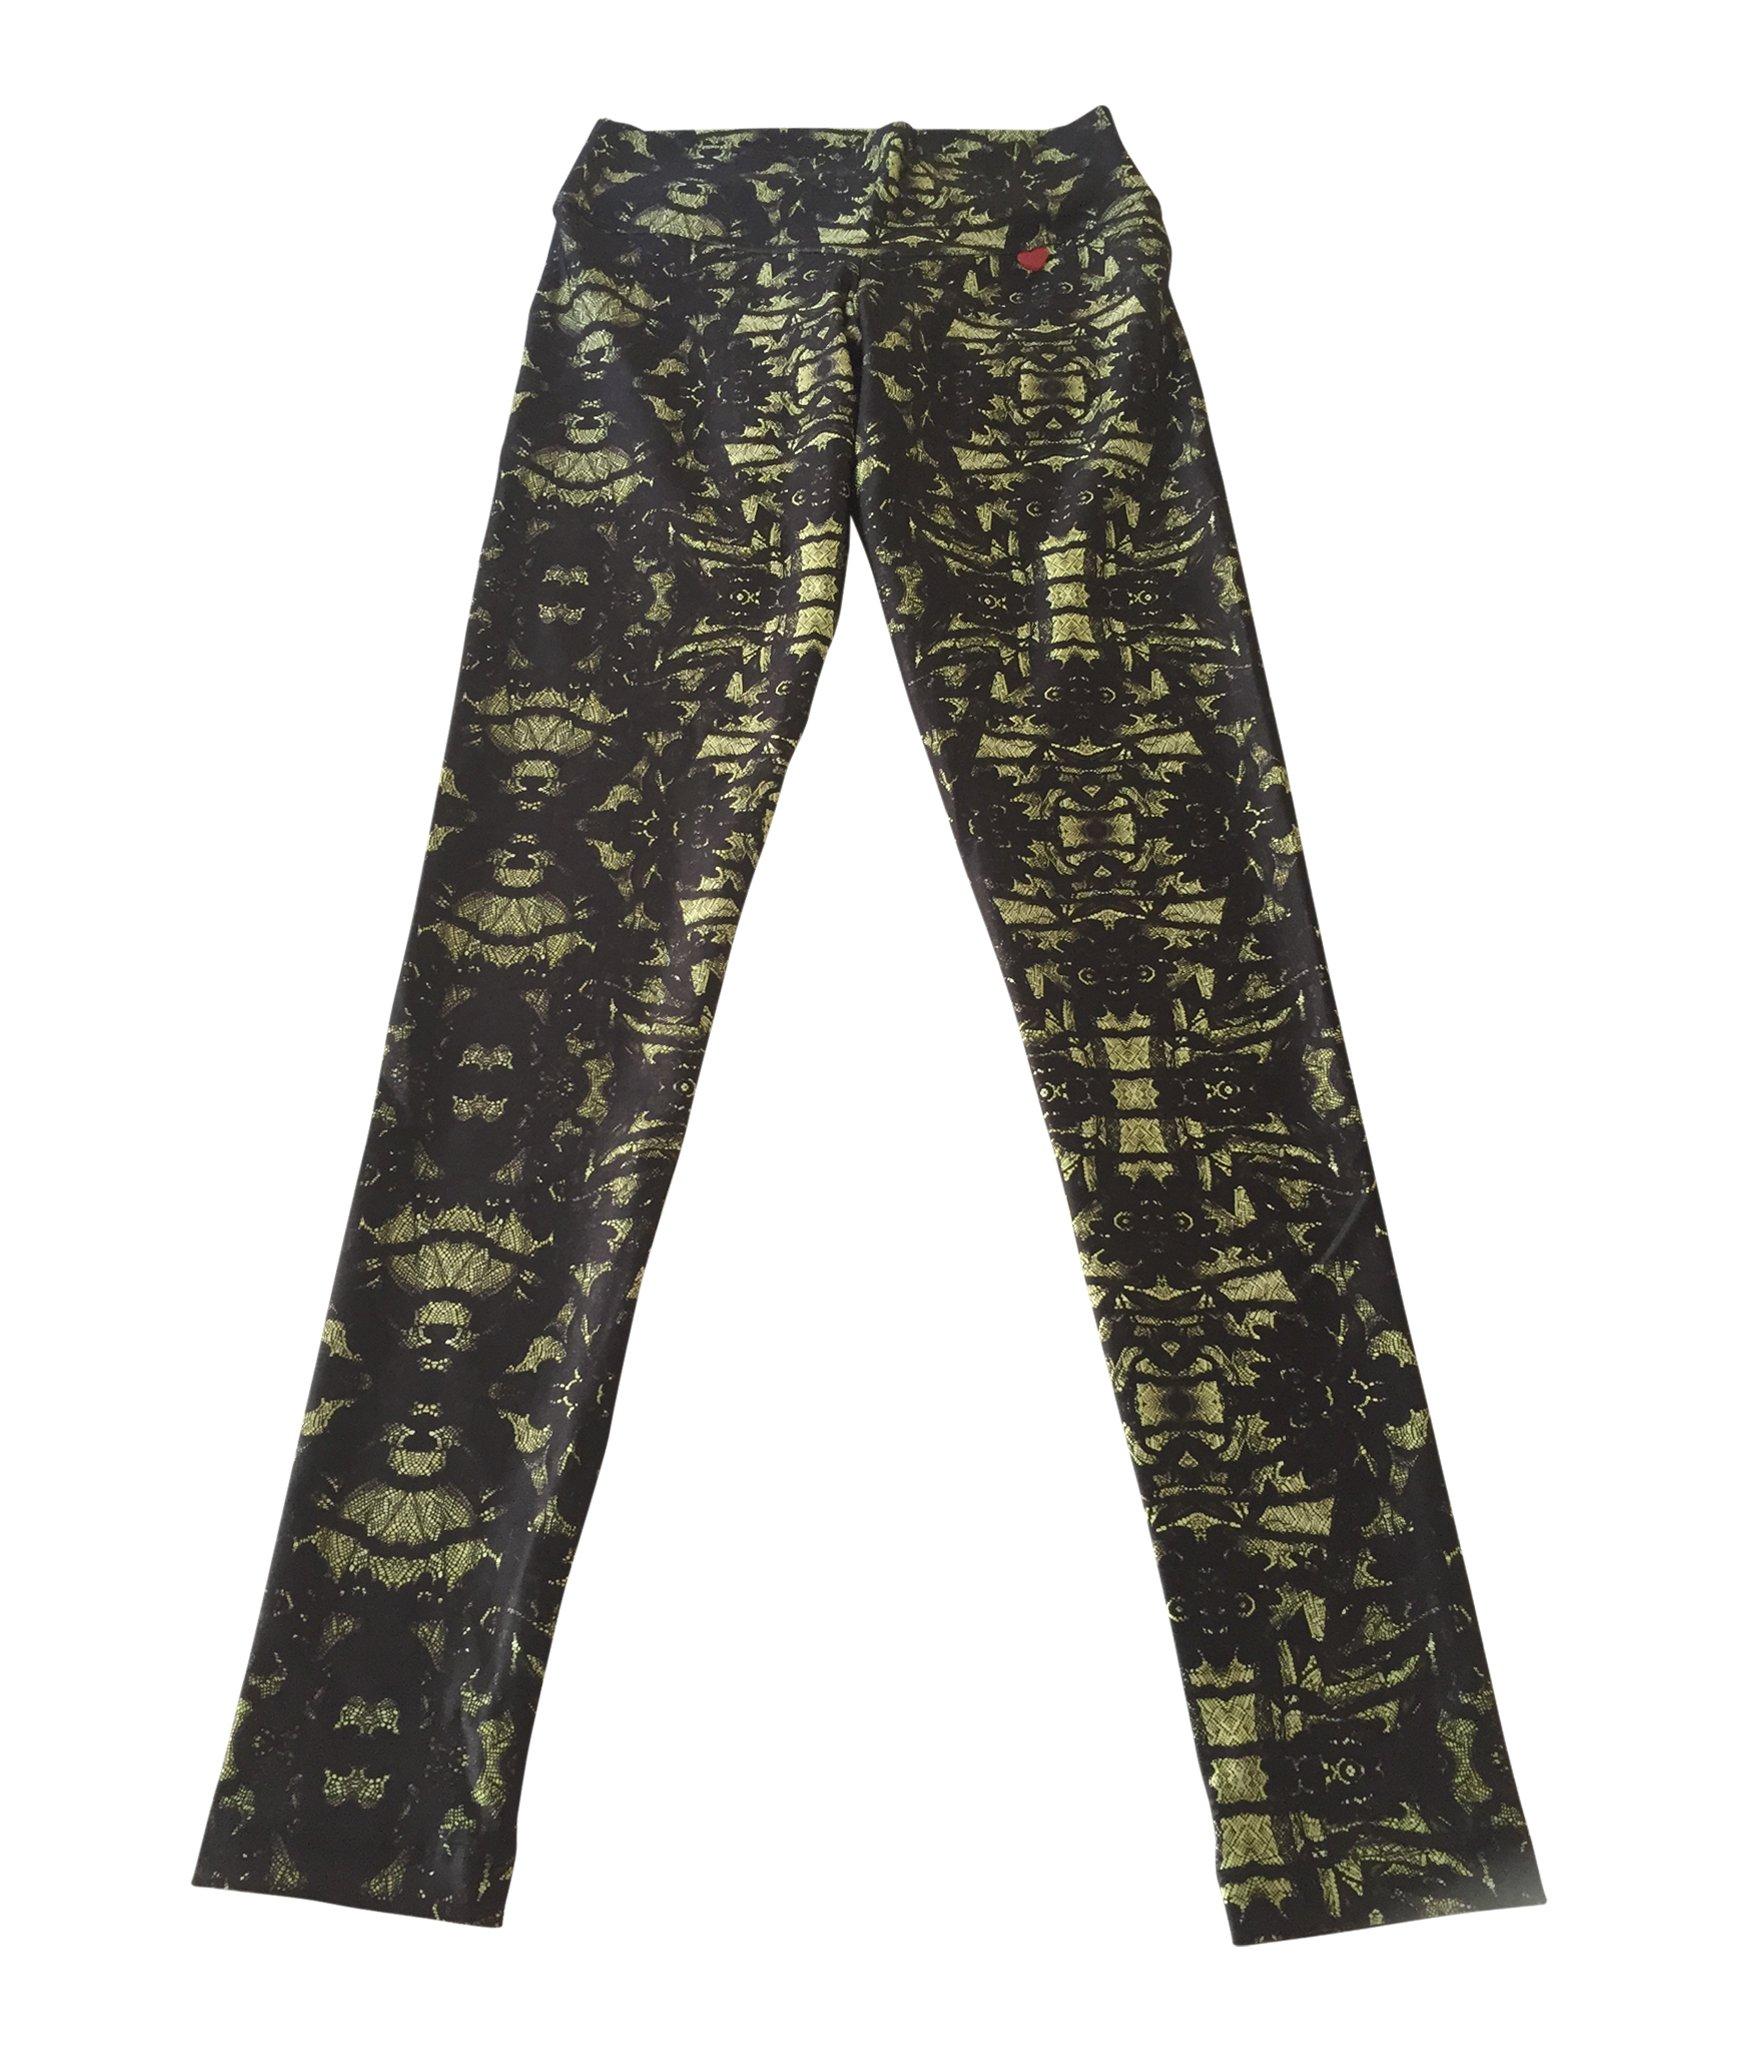 FITMAMA Lace Printed Legging, Sage Lace, Medium